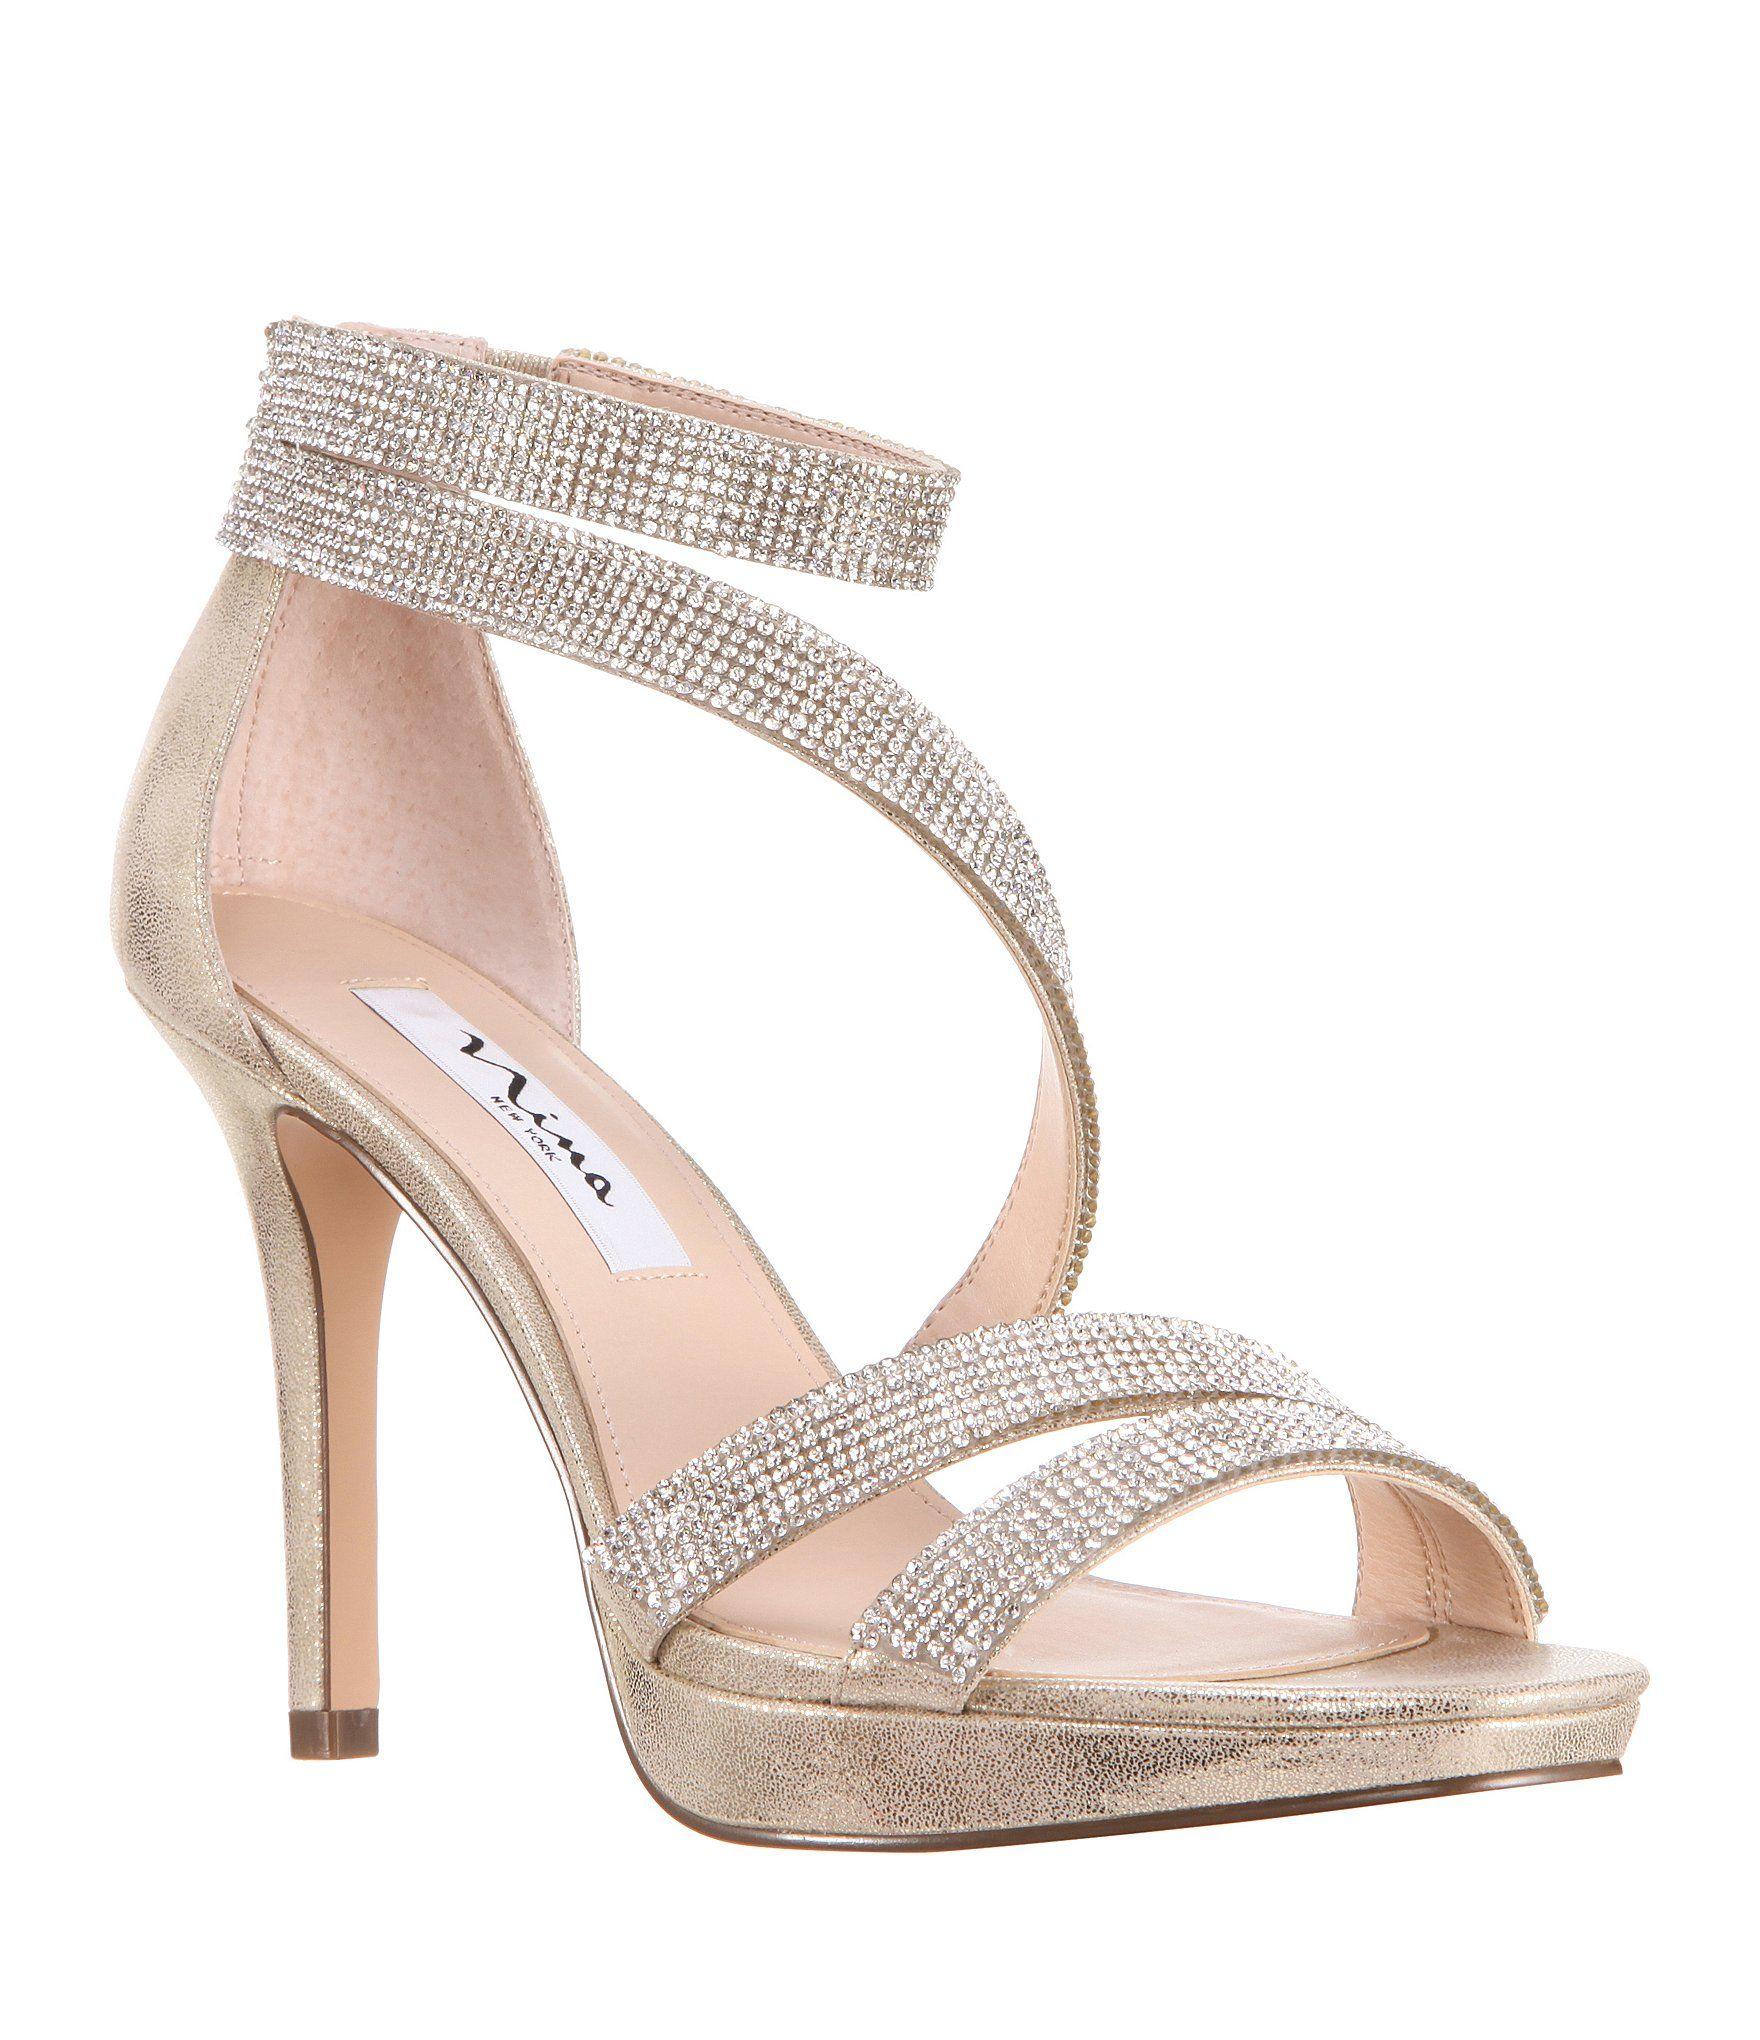 62db9770c9f Ariella Ankle Strap Sandal